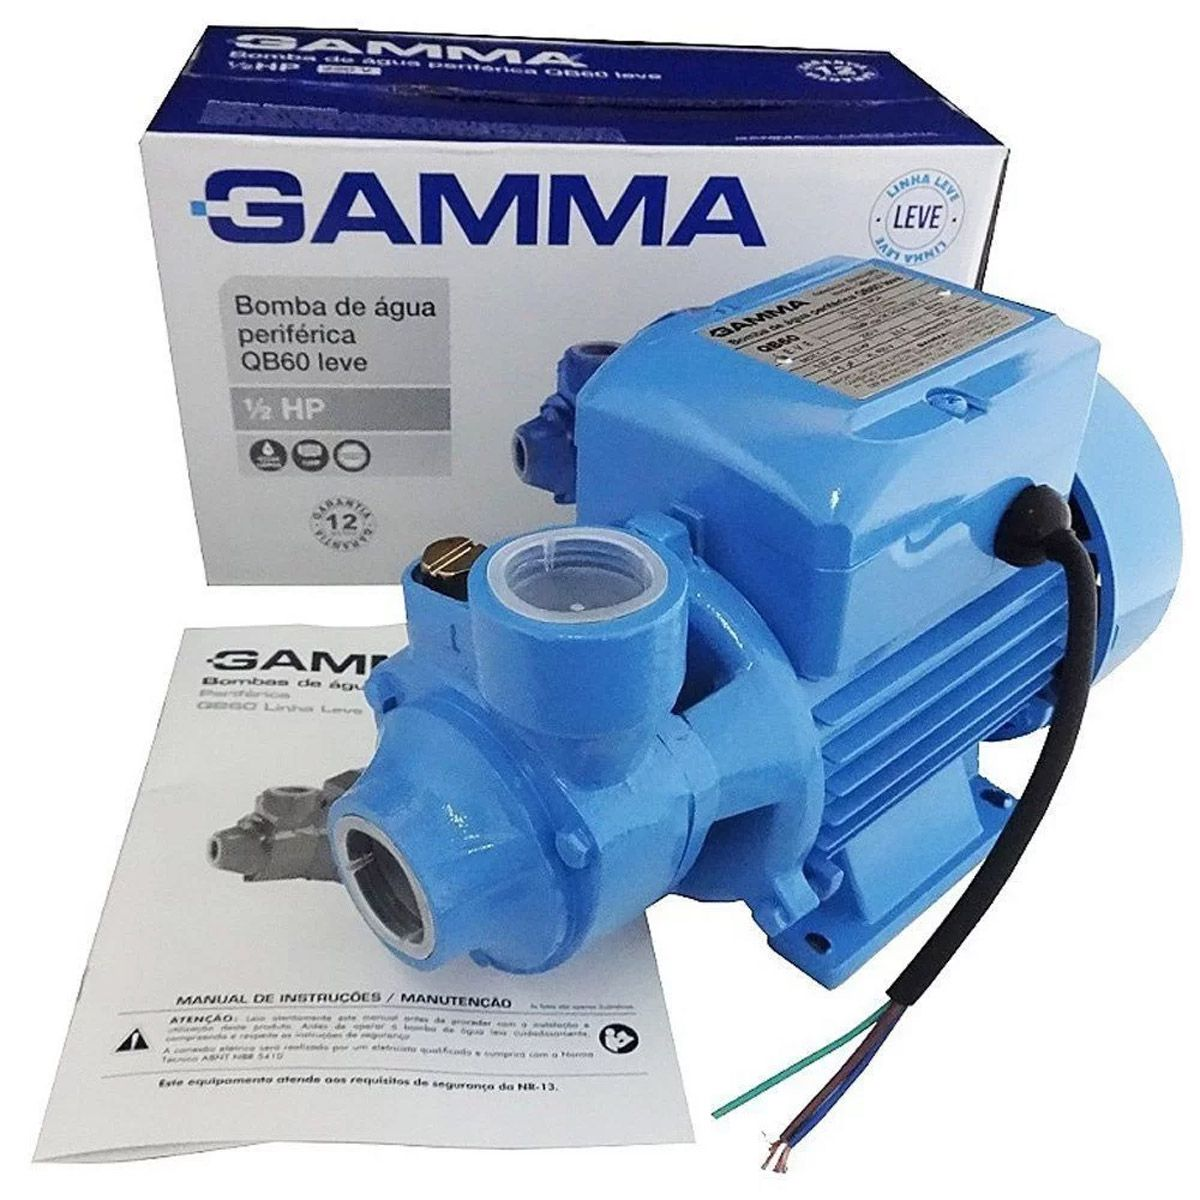 Bomba D`água Periférica 0,5 Cv Qb60 2761 Gamma 220V